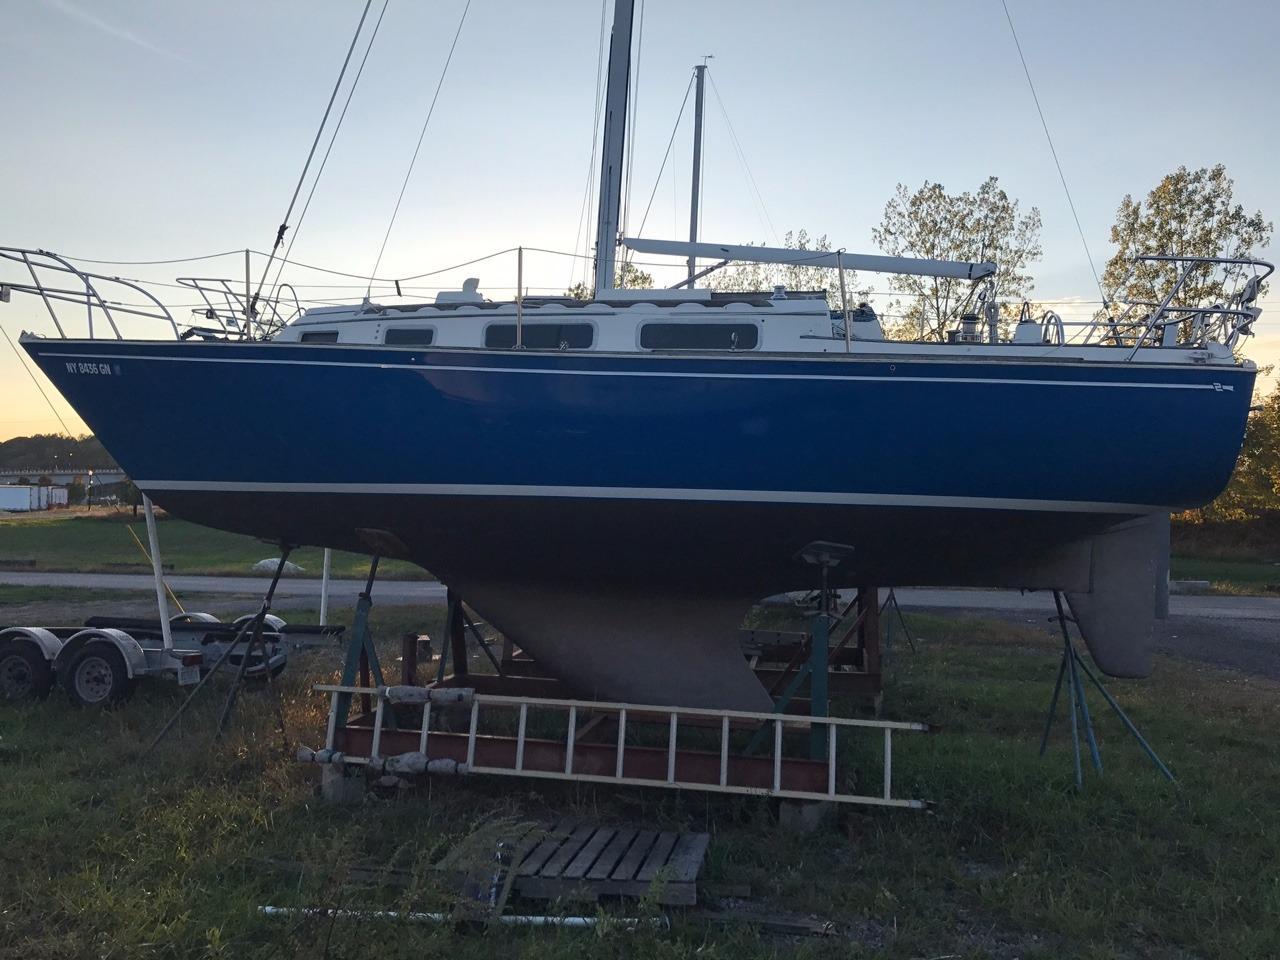 1982 Sabre 28 Sail Boat For Sale Wwwyachtworldcom